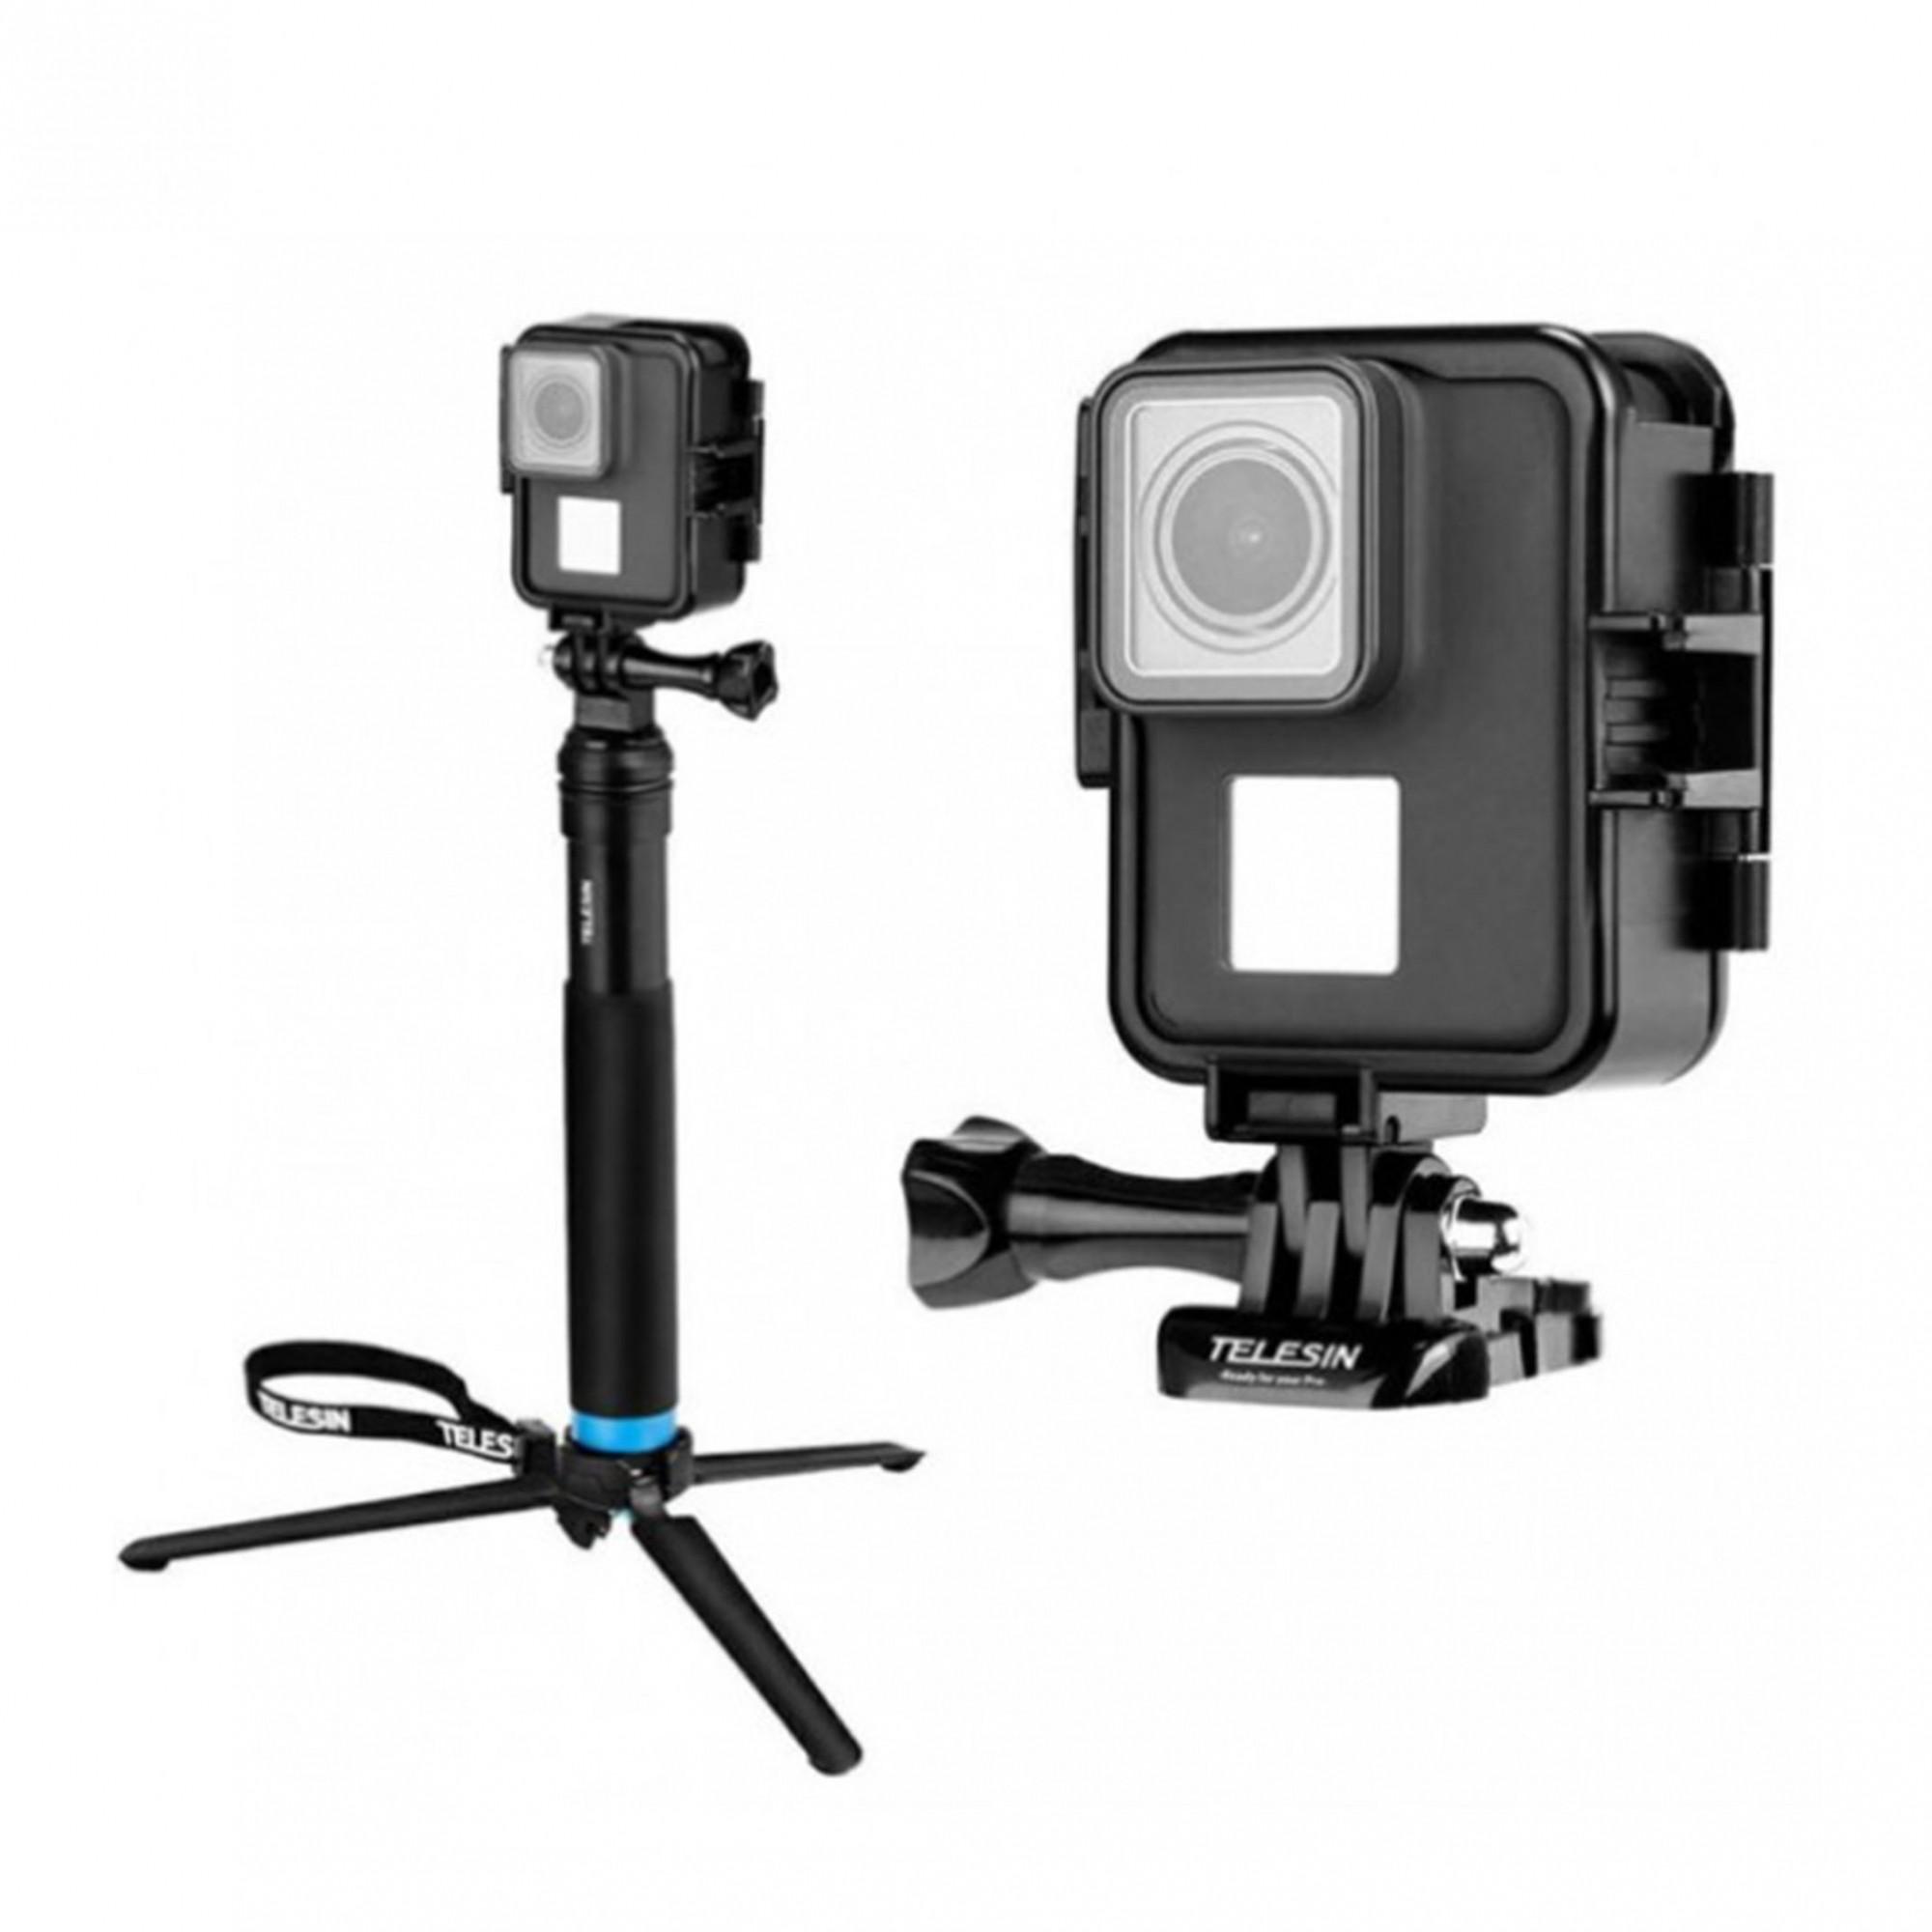 Suporte Vertical GoPro Hero 5 6 7 Black / White / Silver e Hero 2018 Telesin